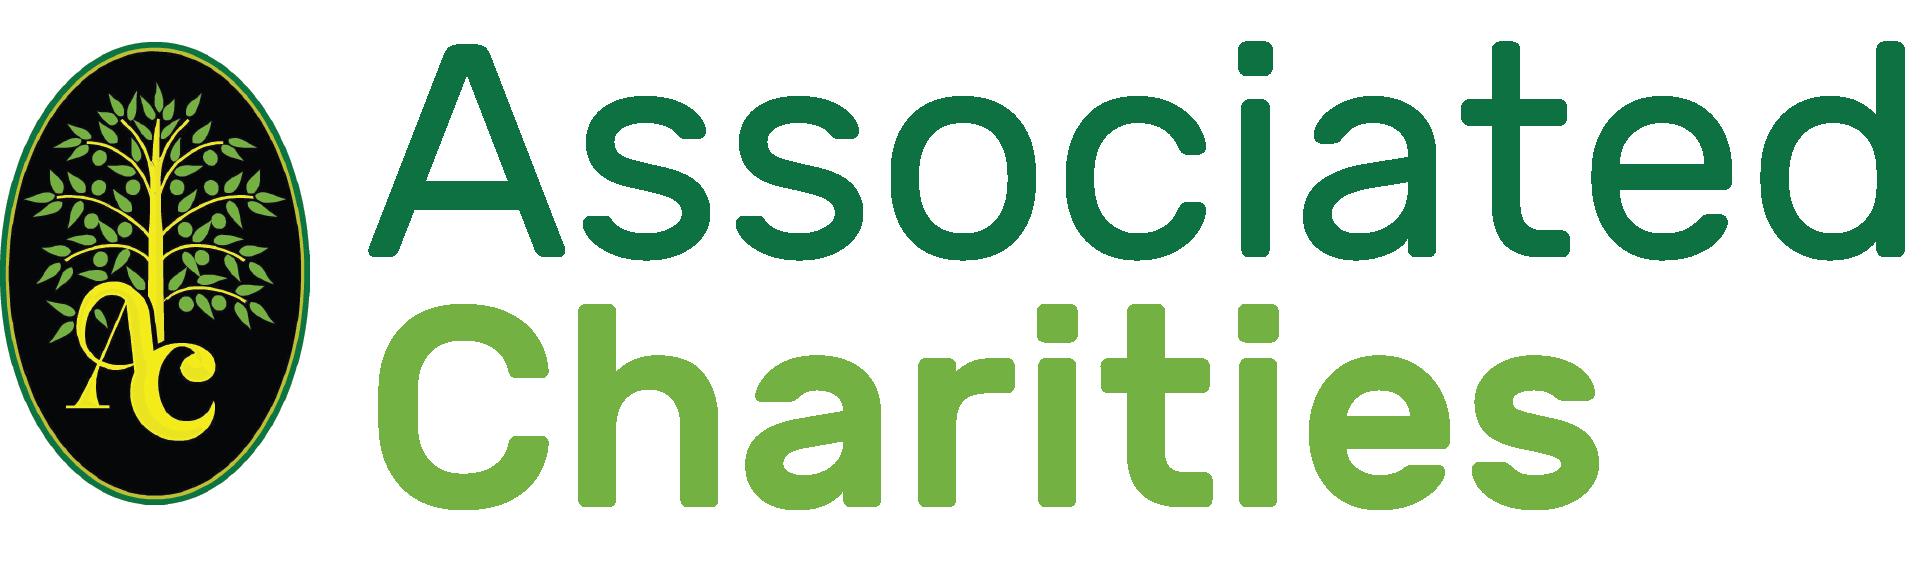 Associated Charities Christmas Sign Up 2020 Associated Charities of Ashland County